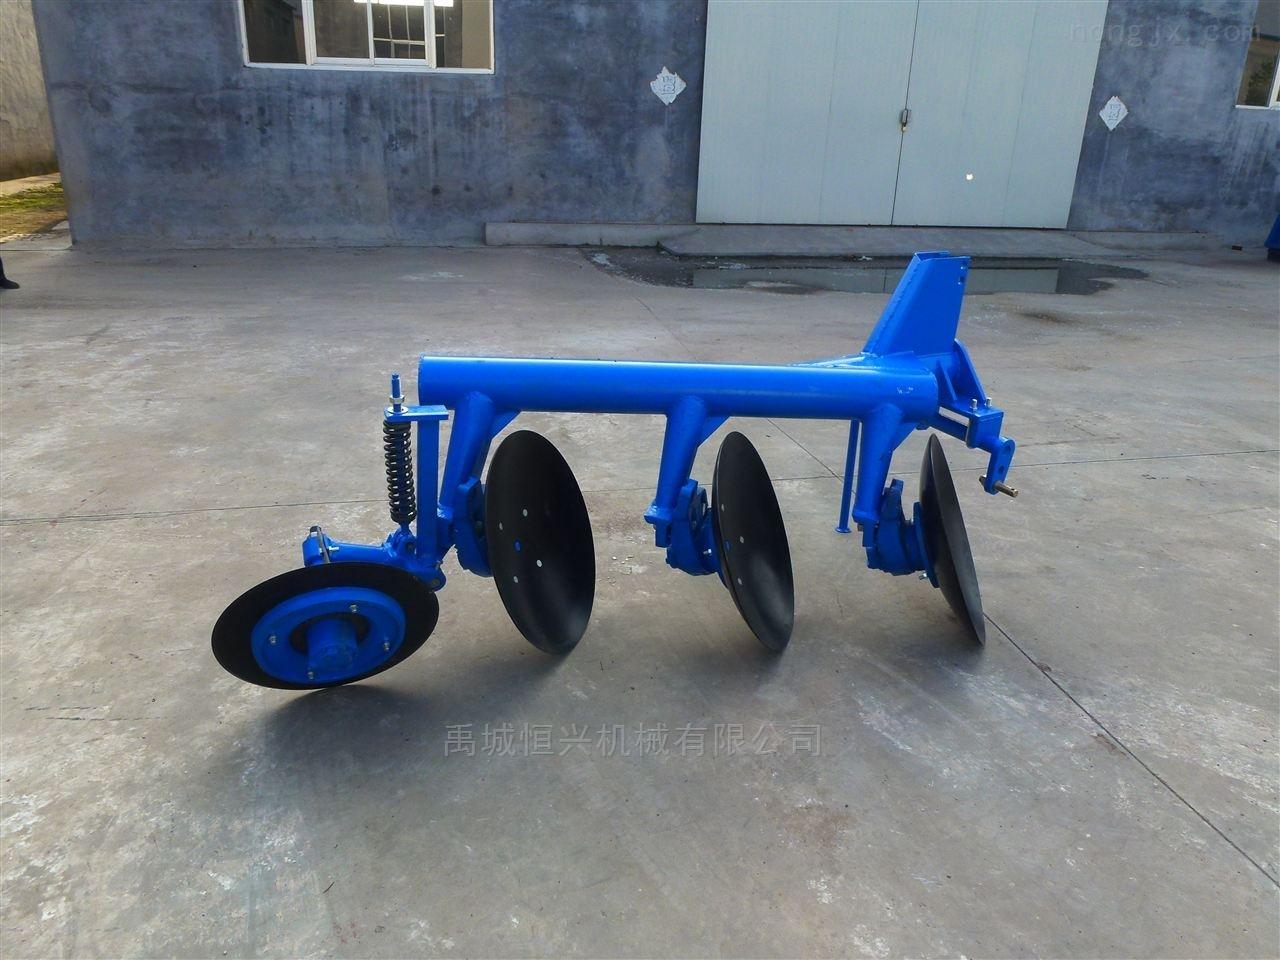 1L系列圓盤犁  農業機械